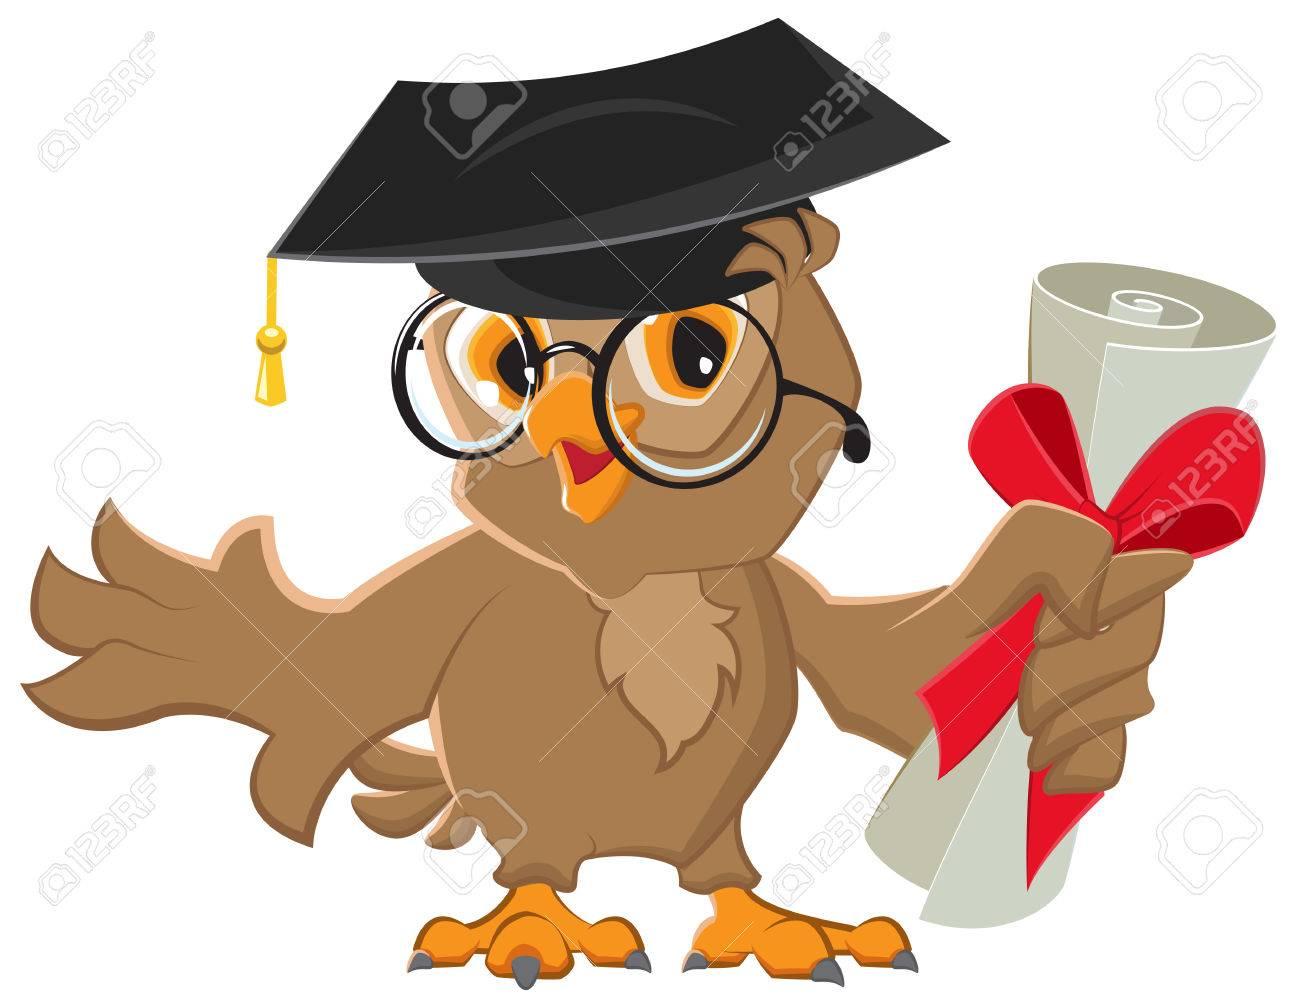 One owl diploma. - 33233861